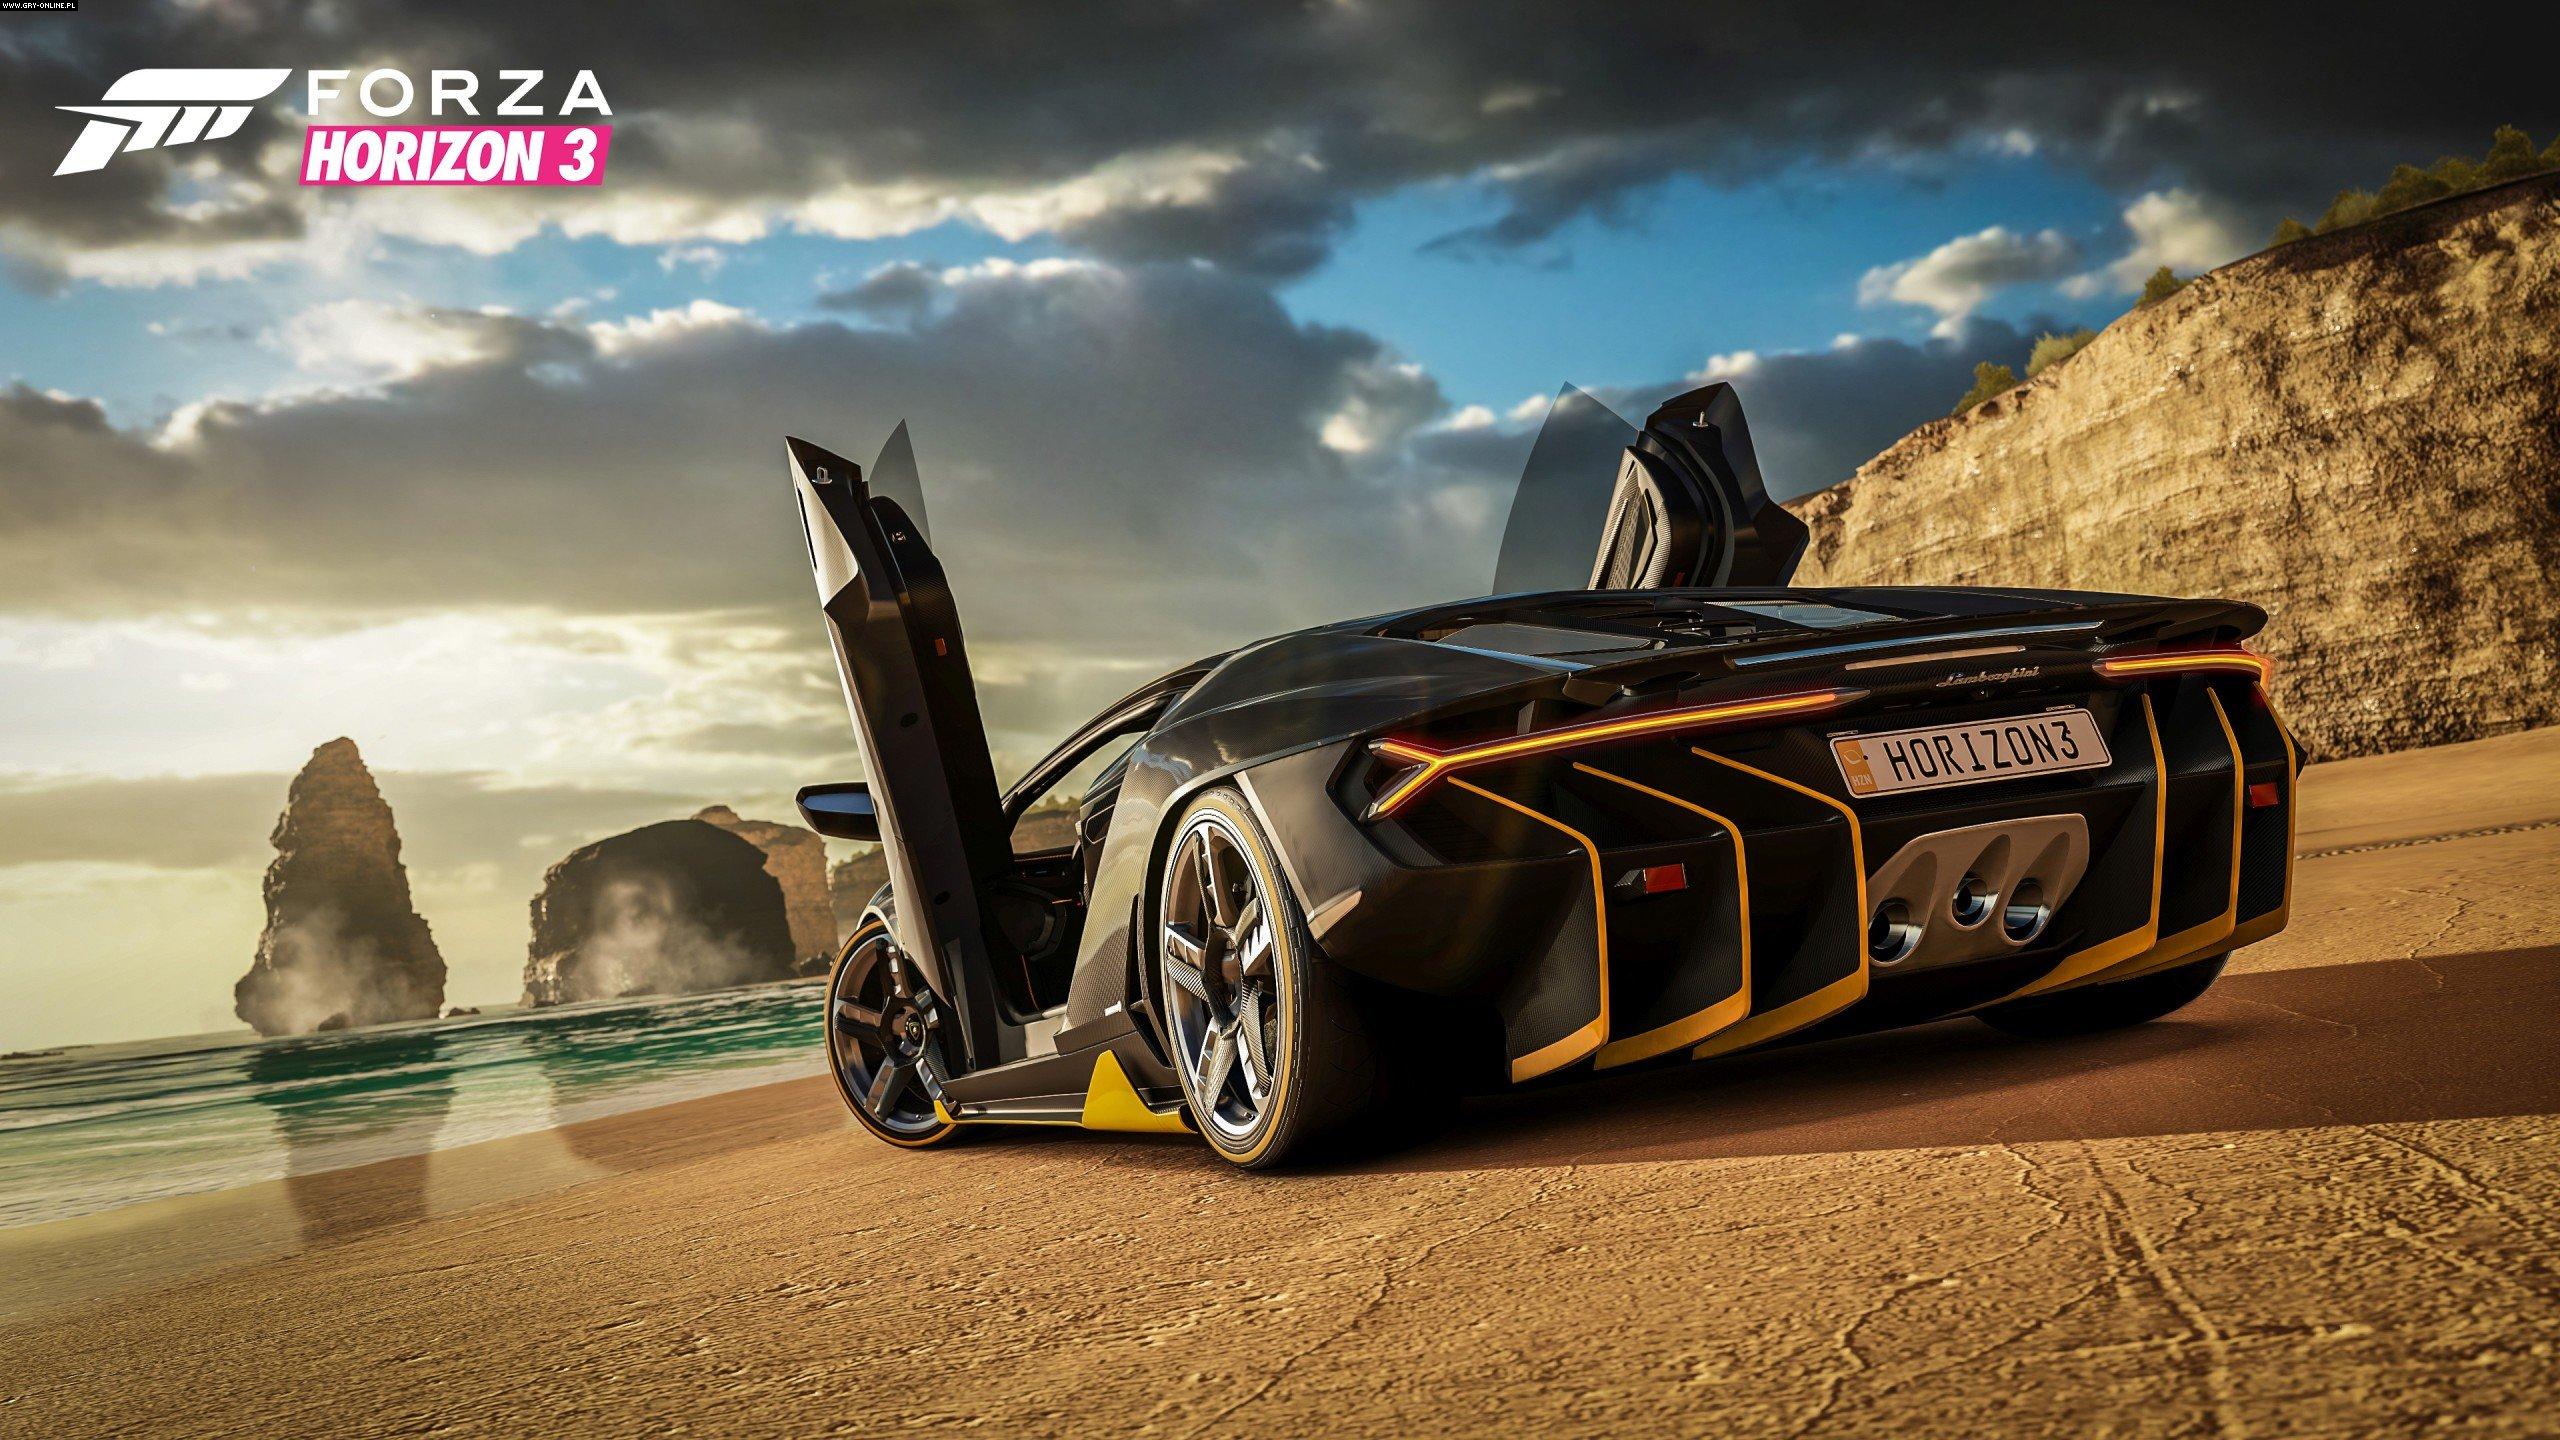 Forza Horizon 3 PC, XONE Games Image 4/11, Playground Games, Microsoft Studios